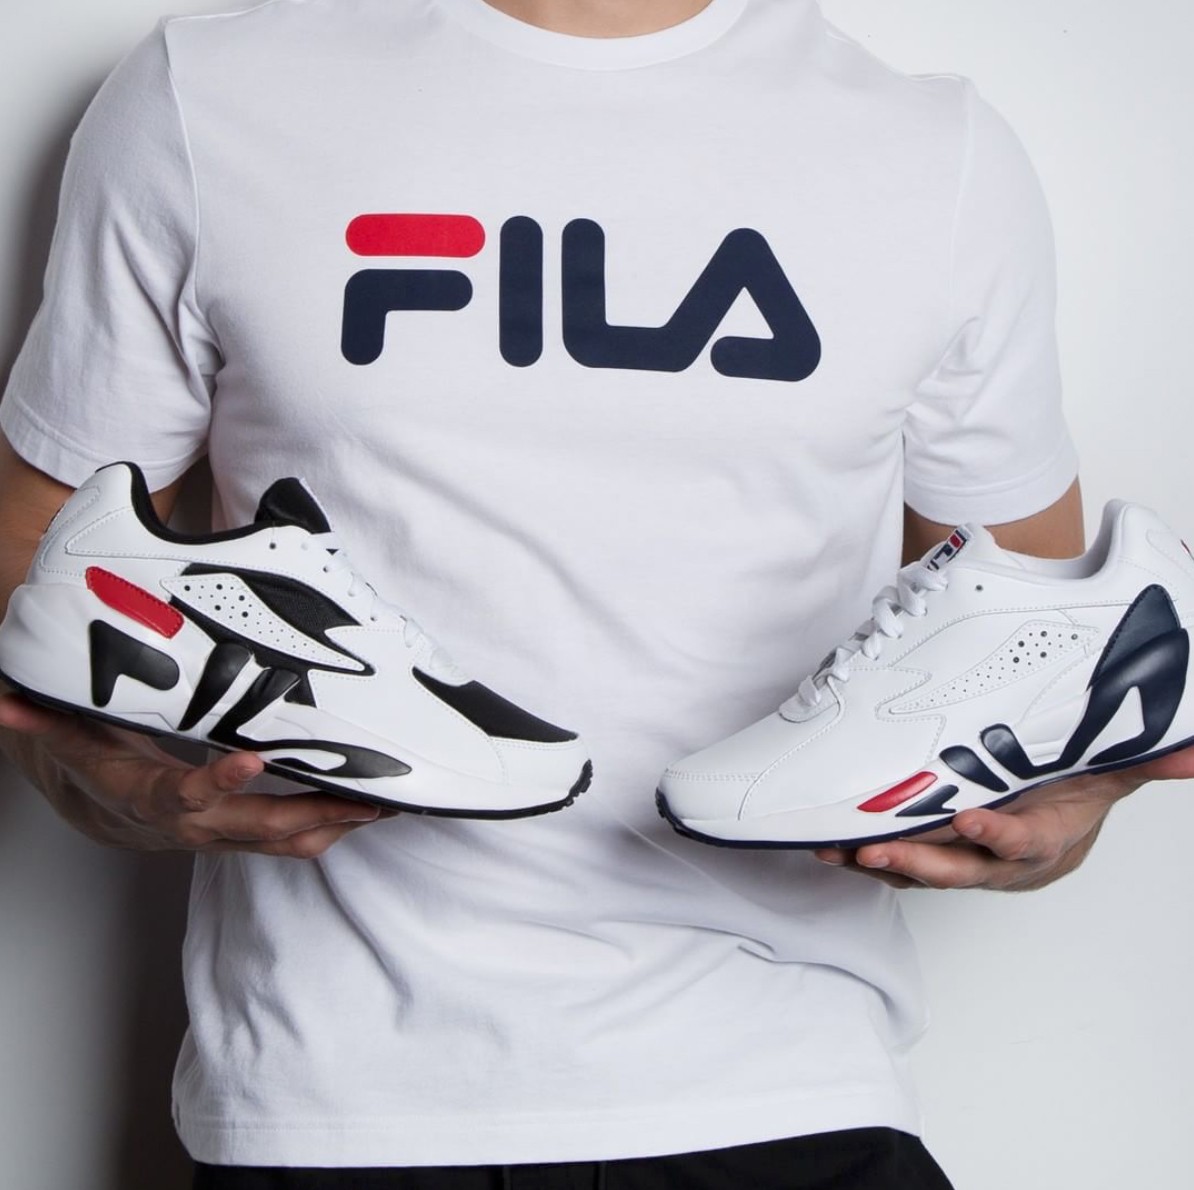 FILA Mindblower Shoe Collection